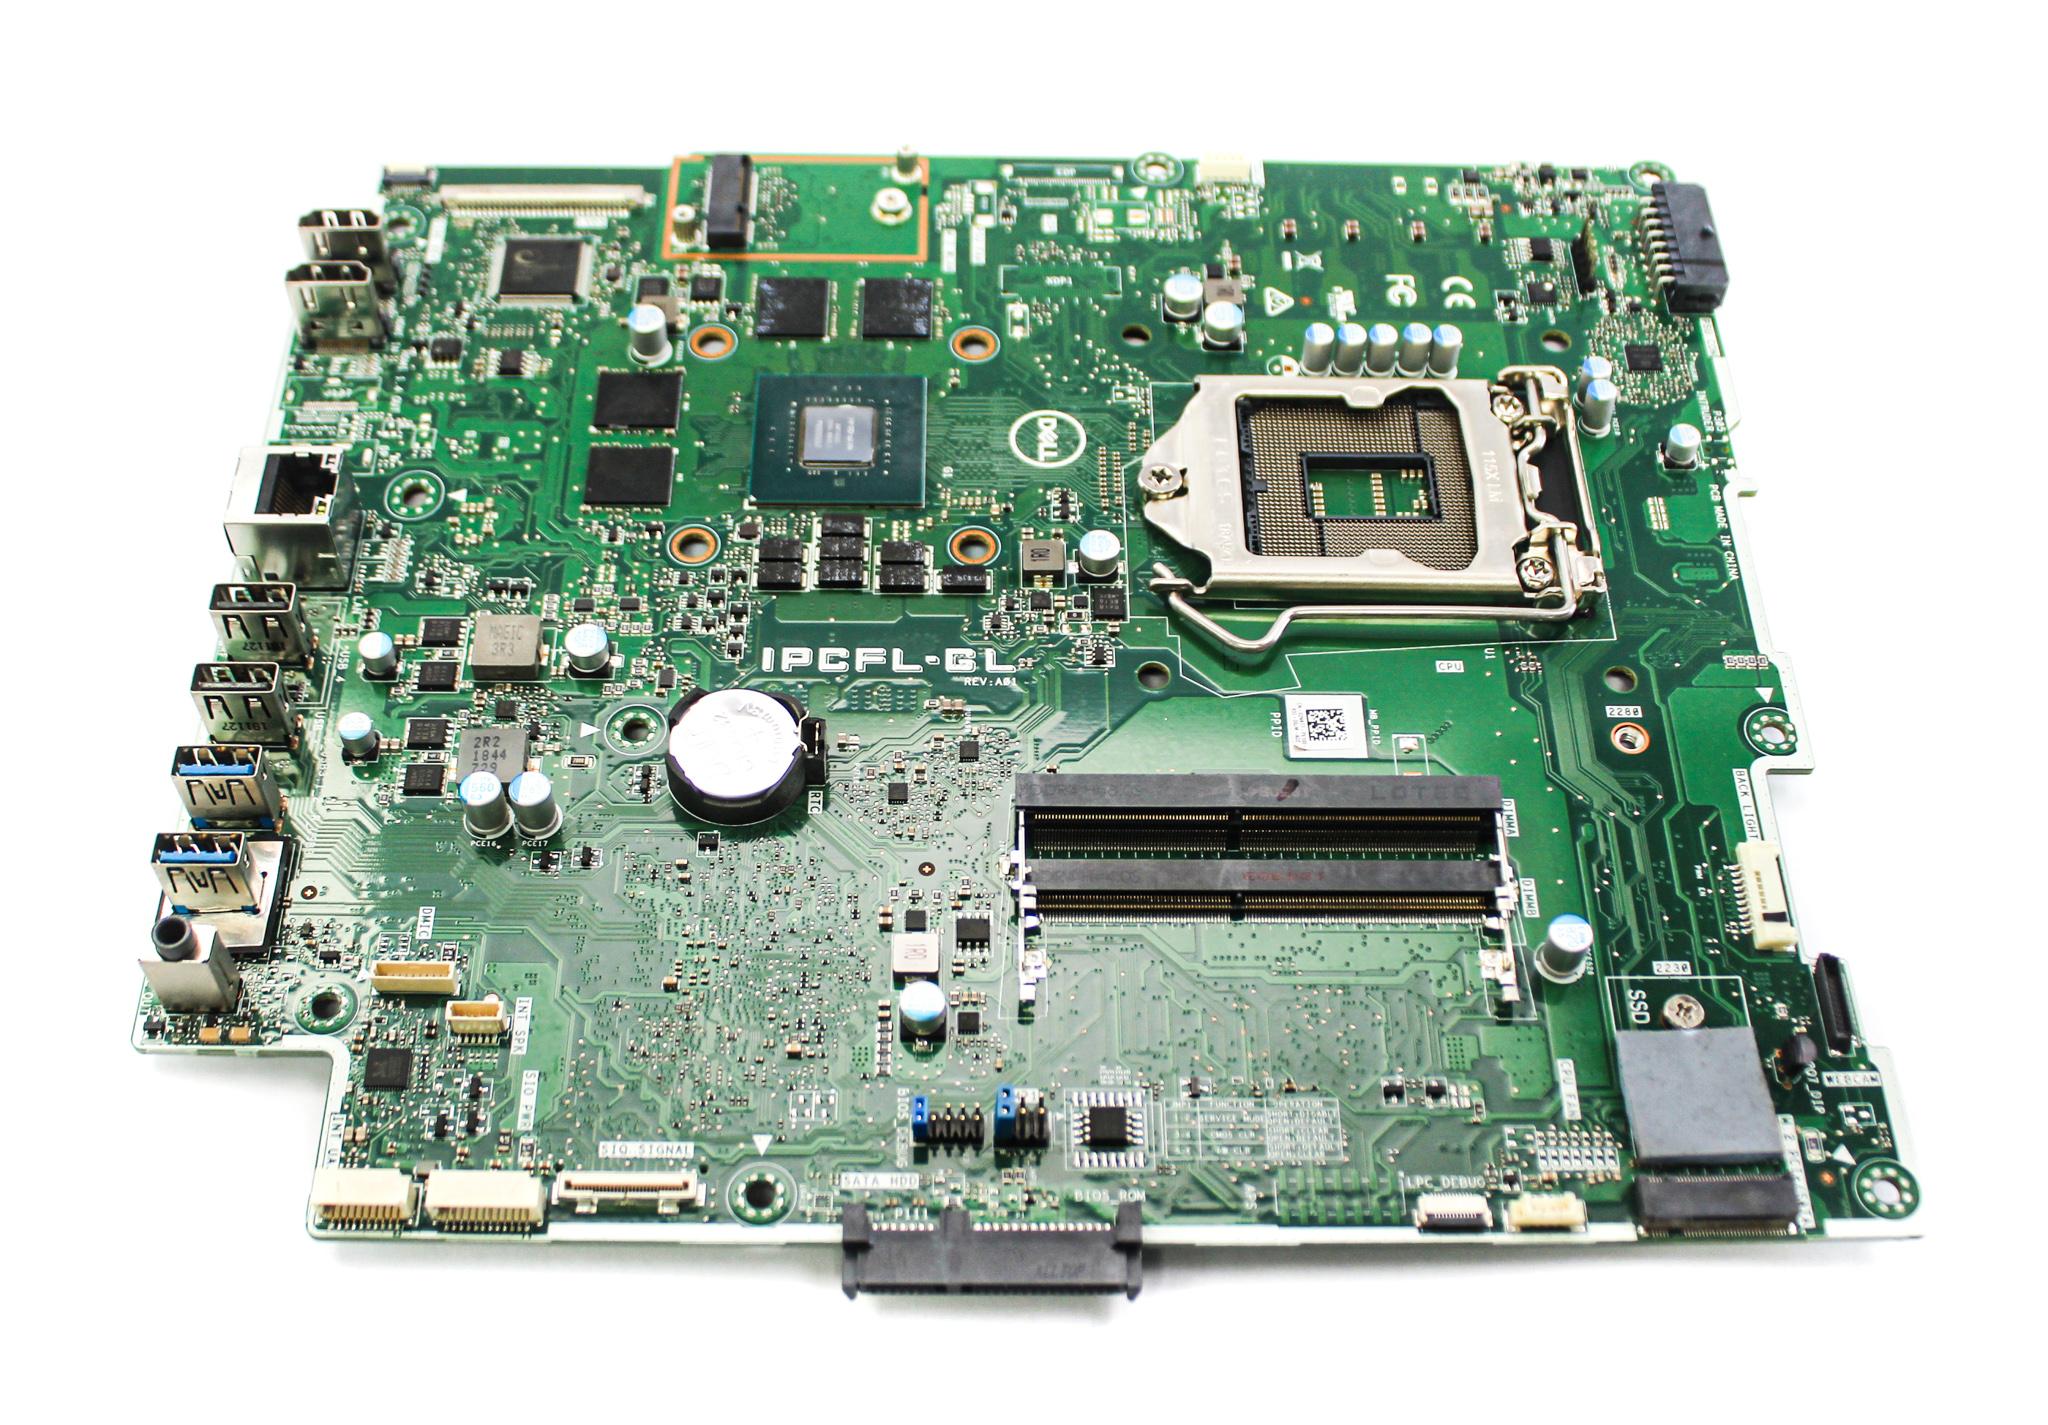 Dell 2NK77 Inspiron 27-7777 AiO PC Motherboard IPCFL-GL (nVidia Graphics)